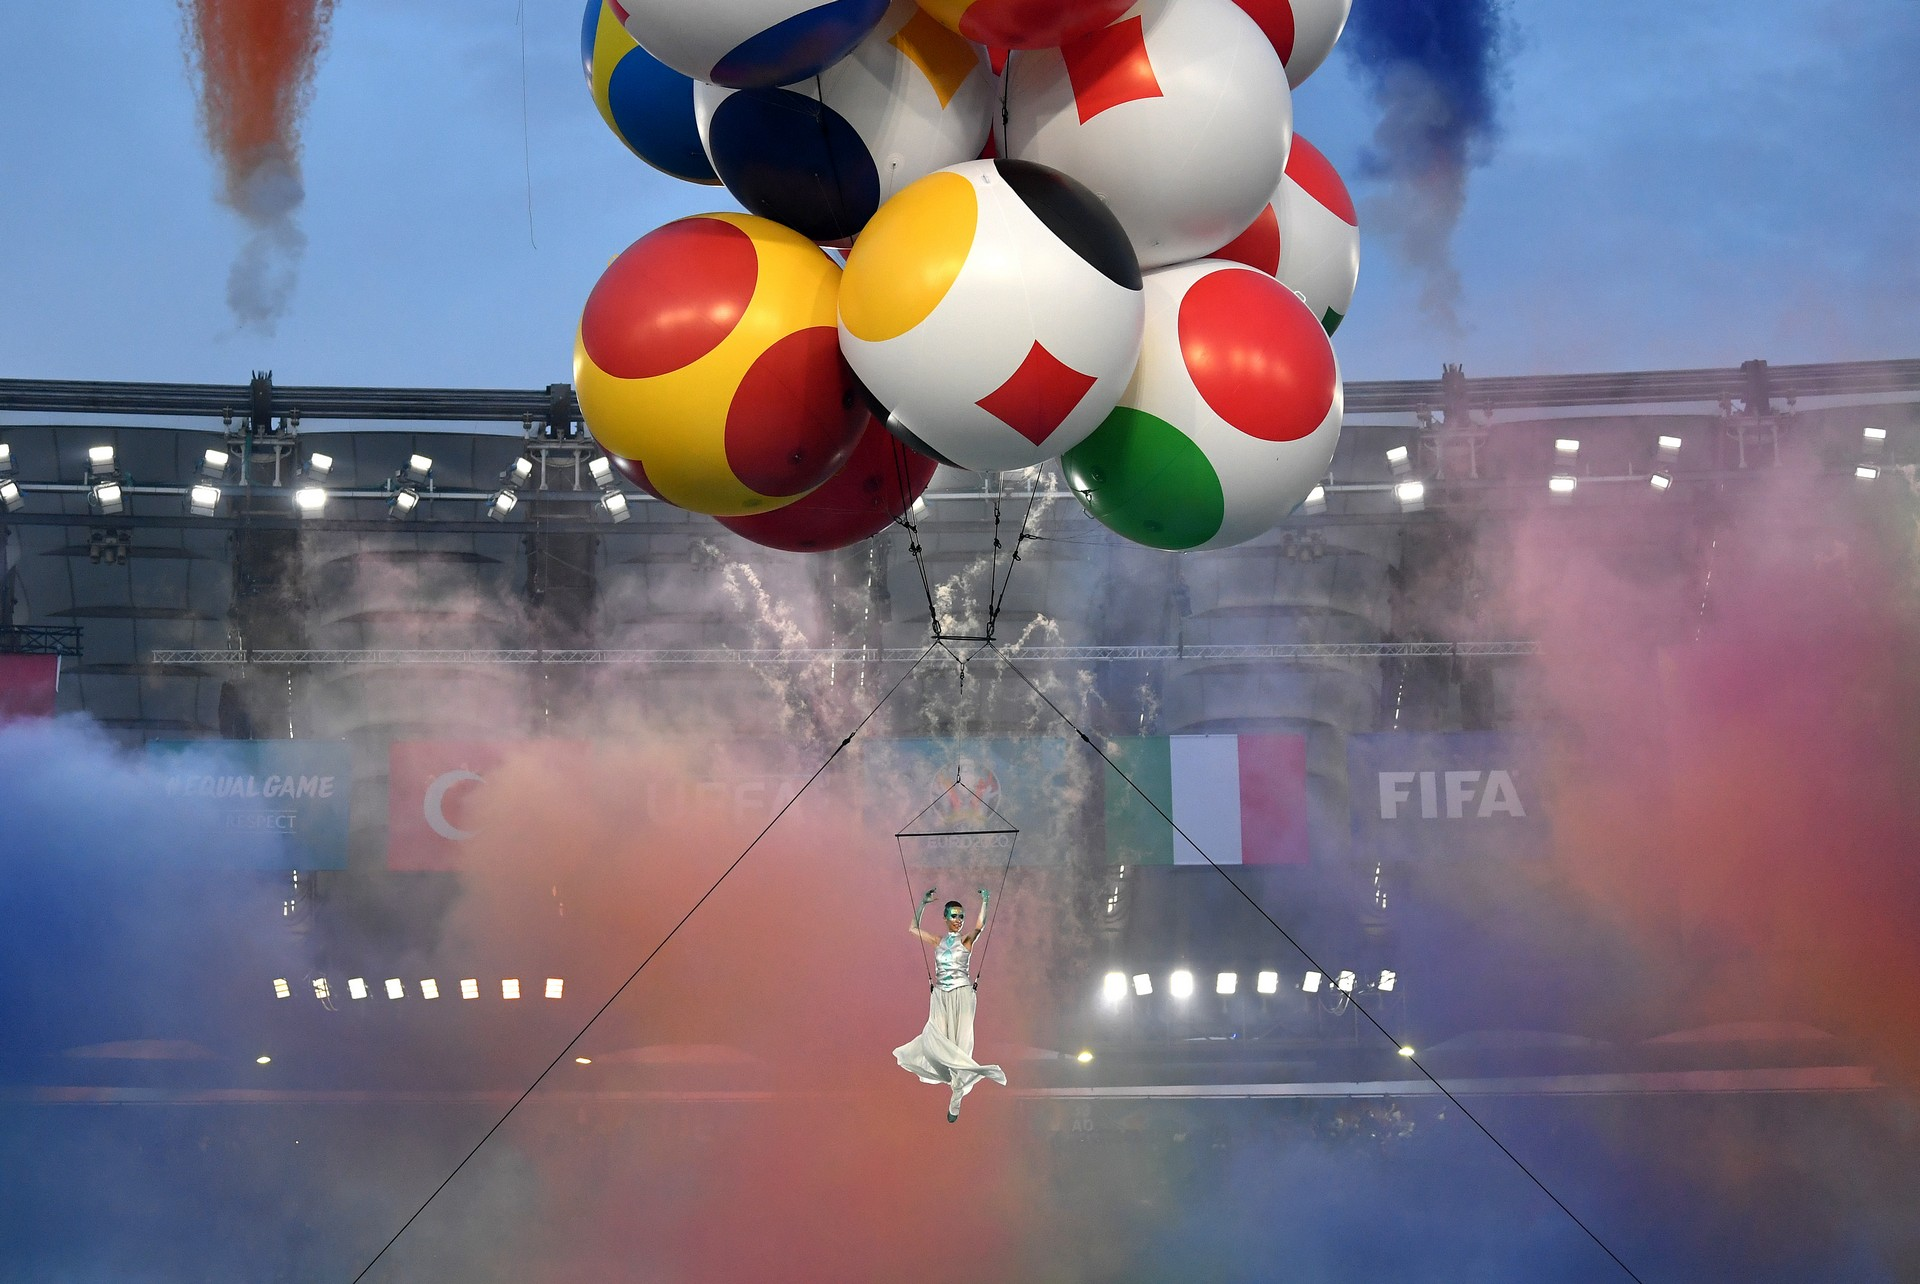 Photo by Valerio Pennicino - UEFA/UEFA via Getty Images